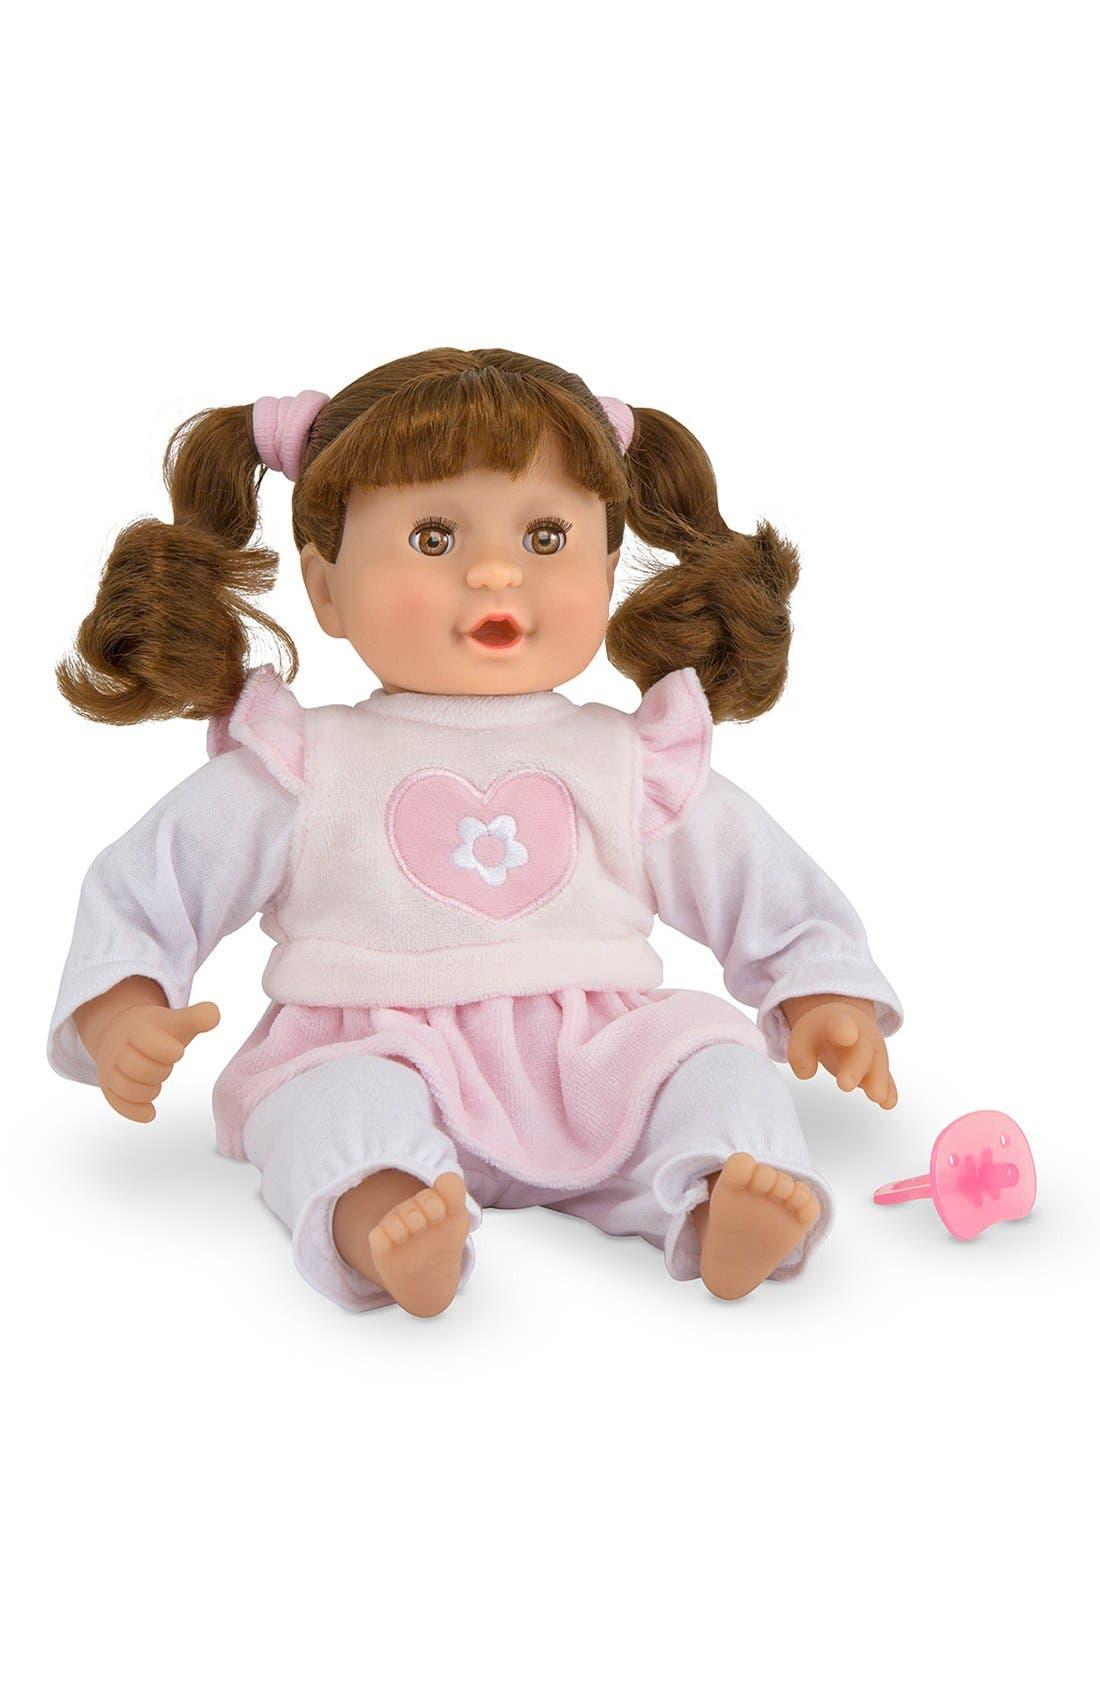 Melissa & Doug 'Mine to Love - Brianna' Doll